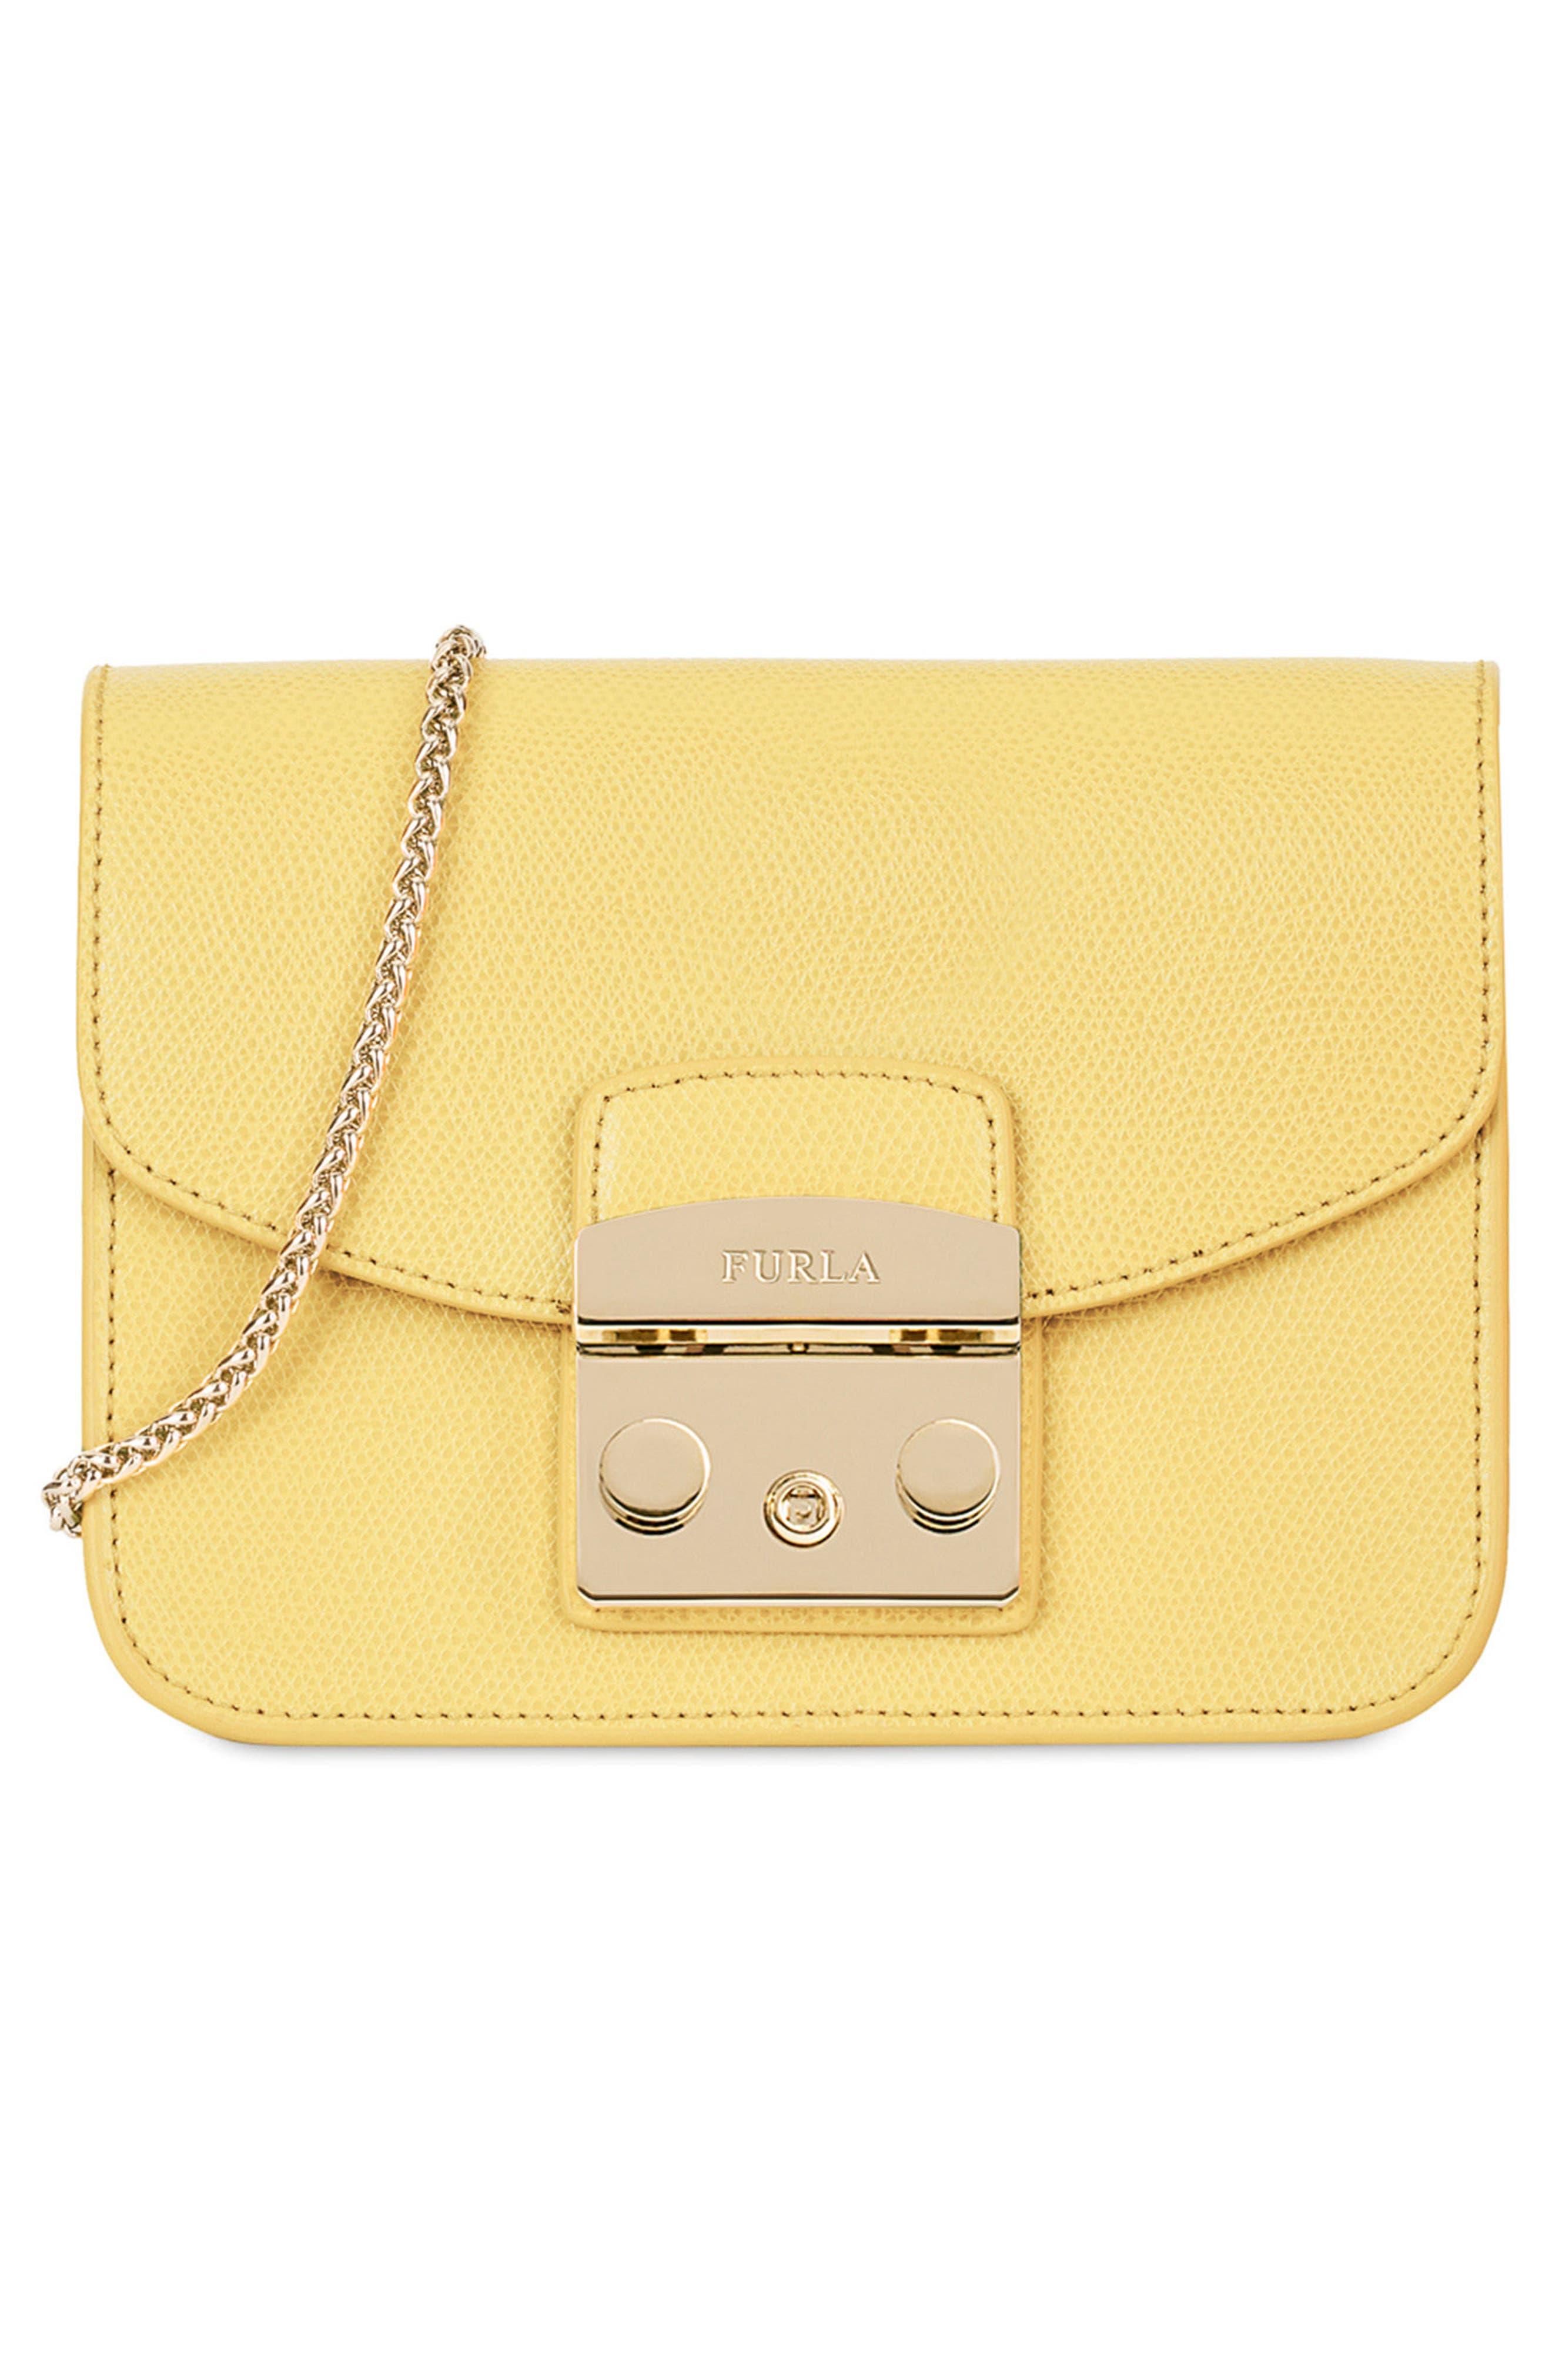 Alternate Image 1 Selected - Furla Mini Metropolis Leather Crossbody Bag